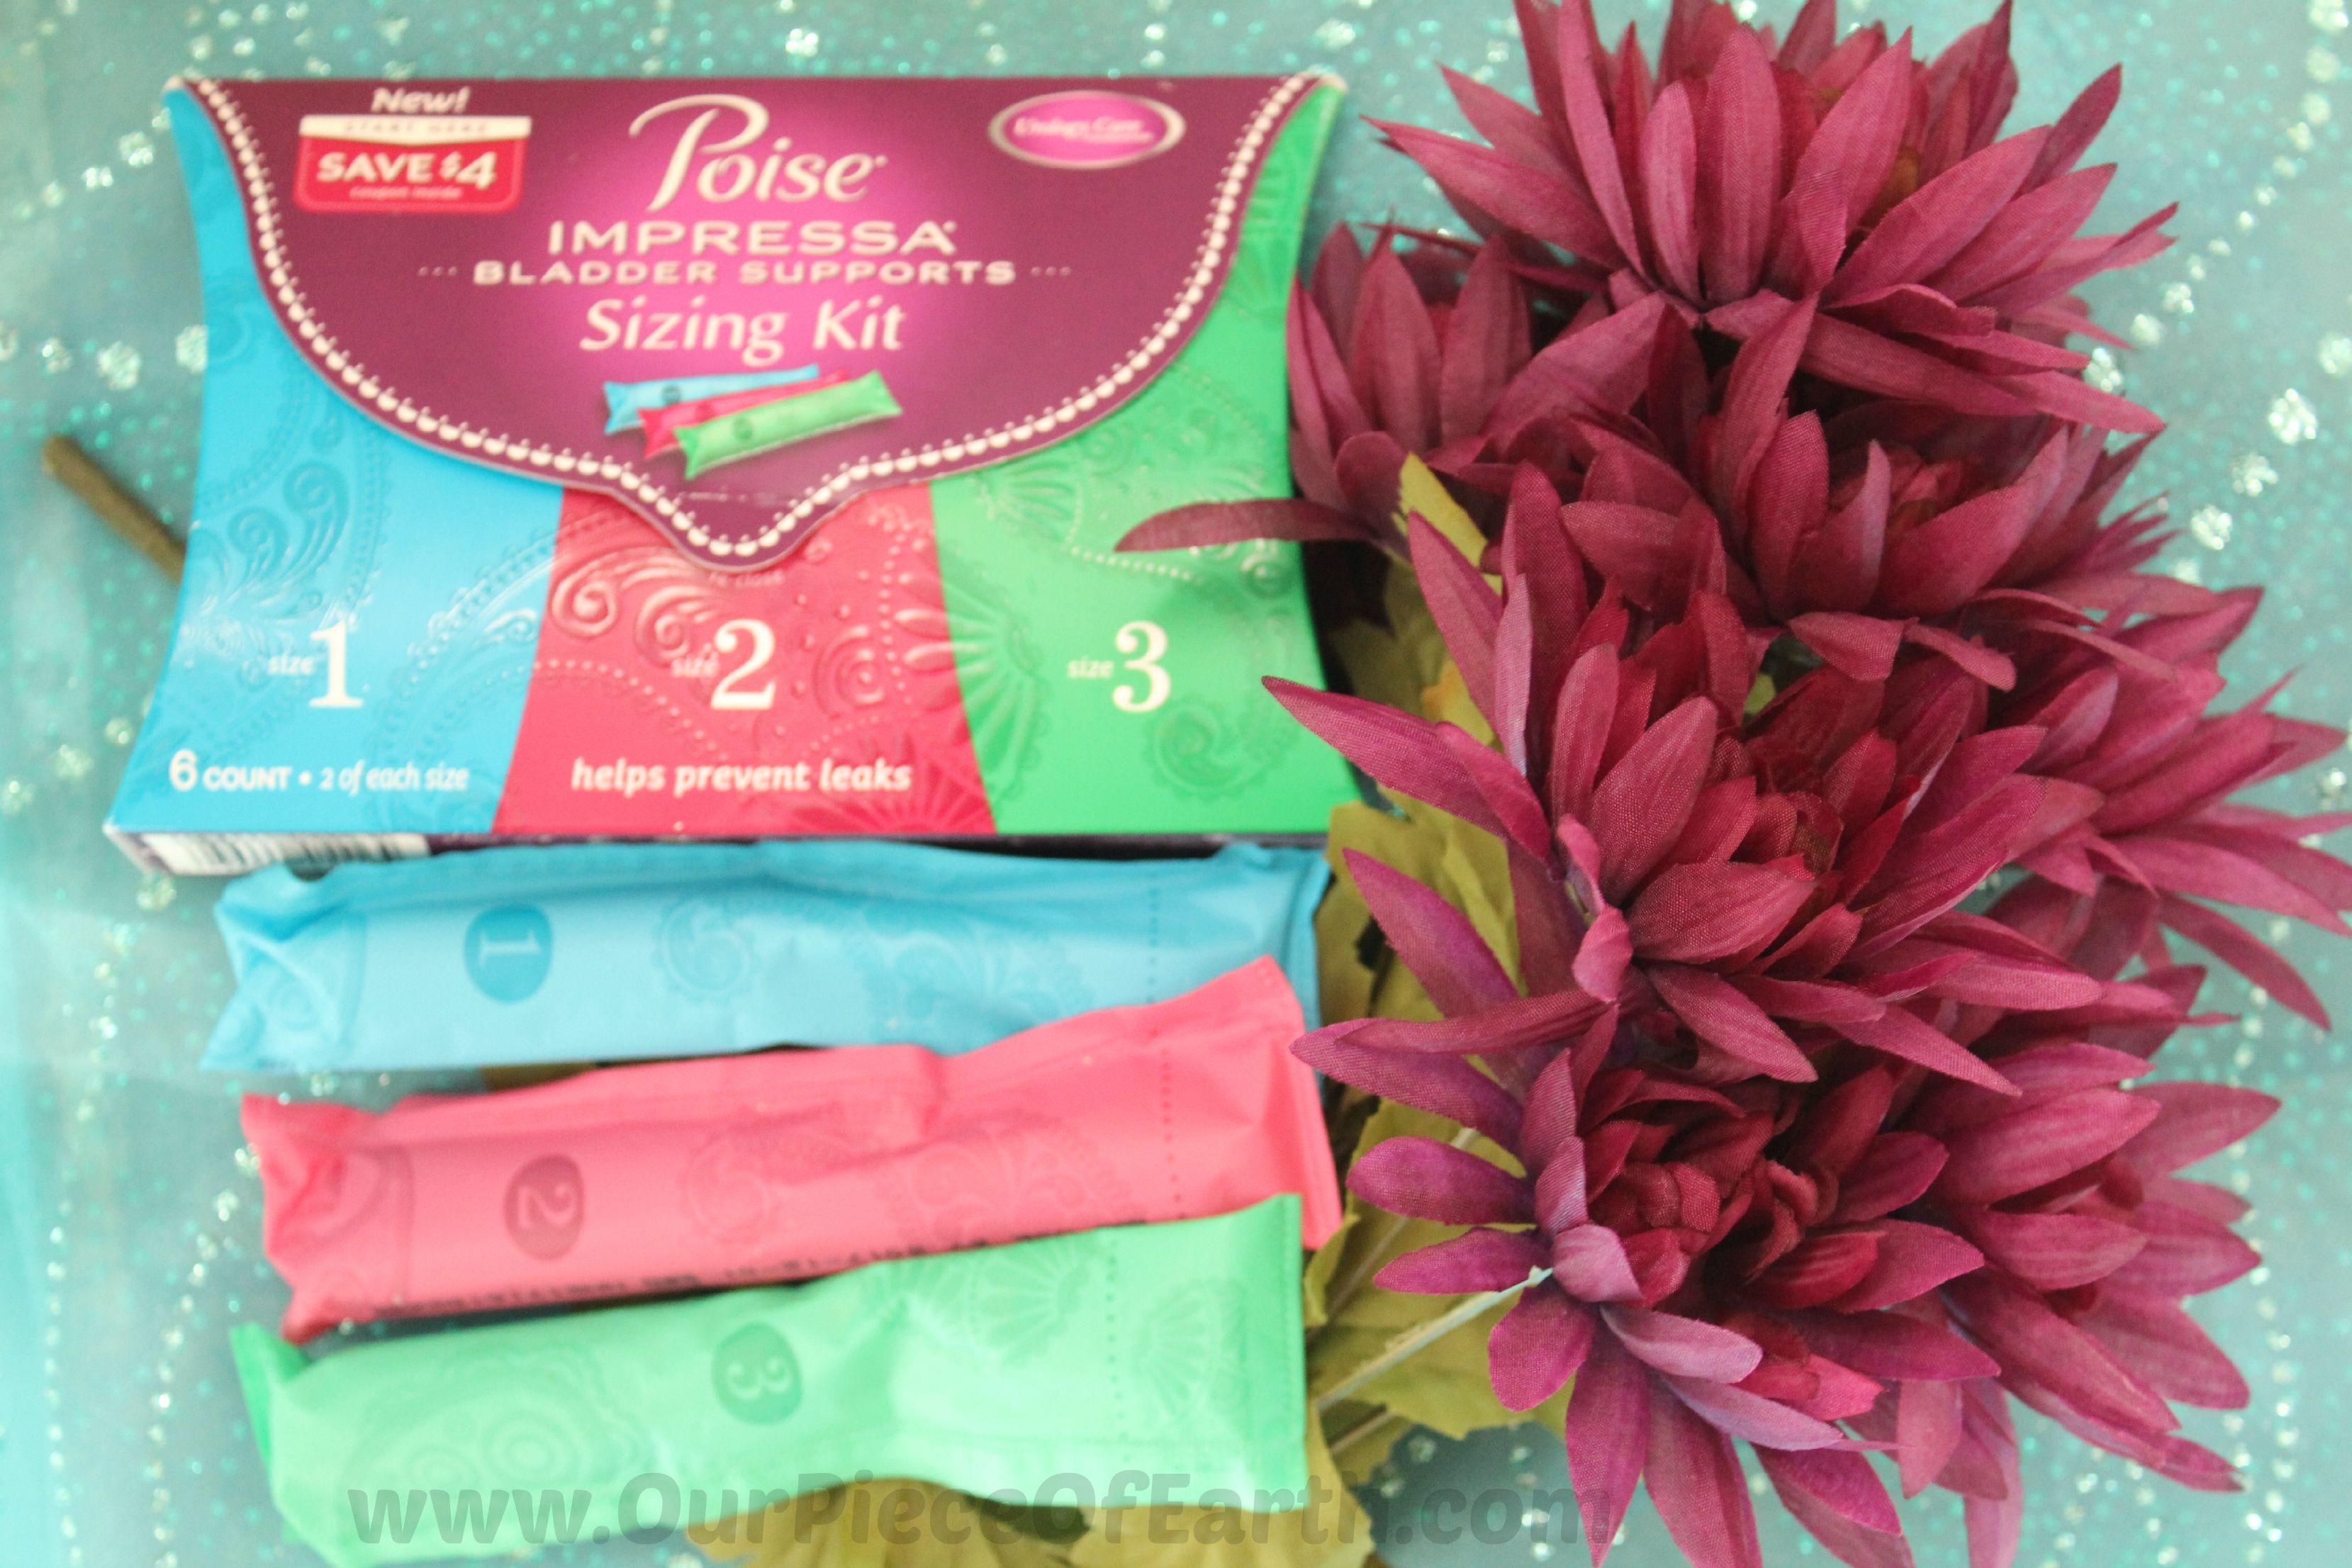 Stop bladder leakage with Poise Impressa